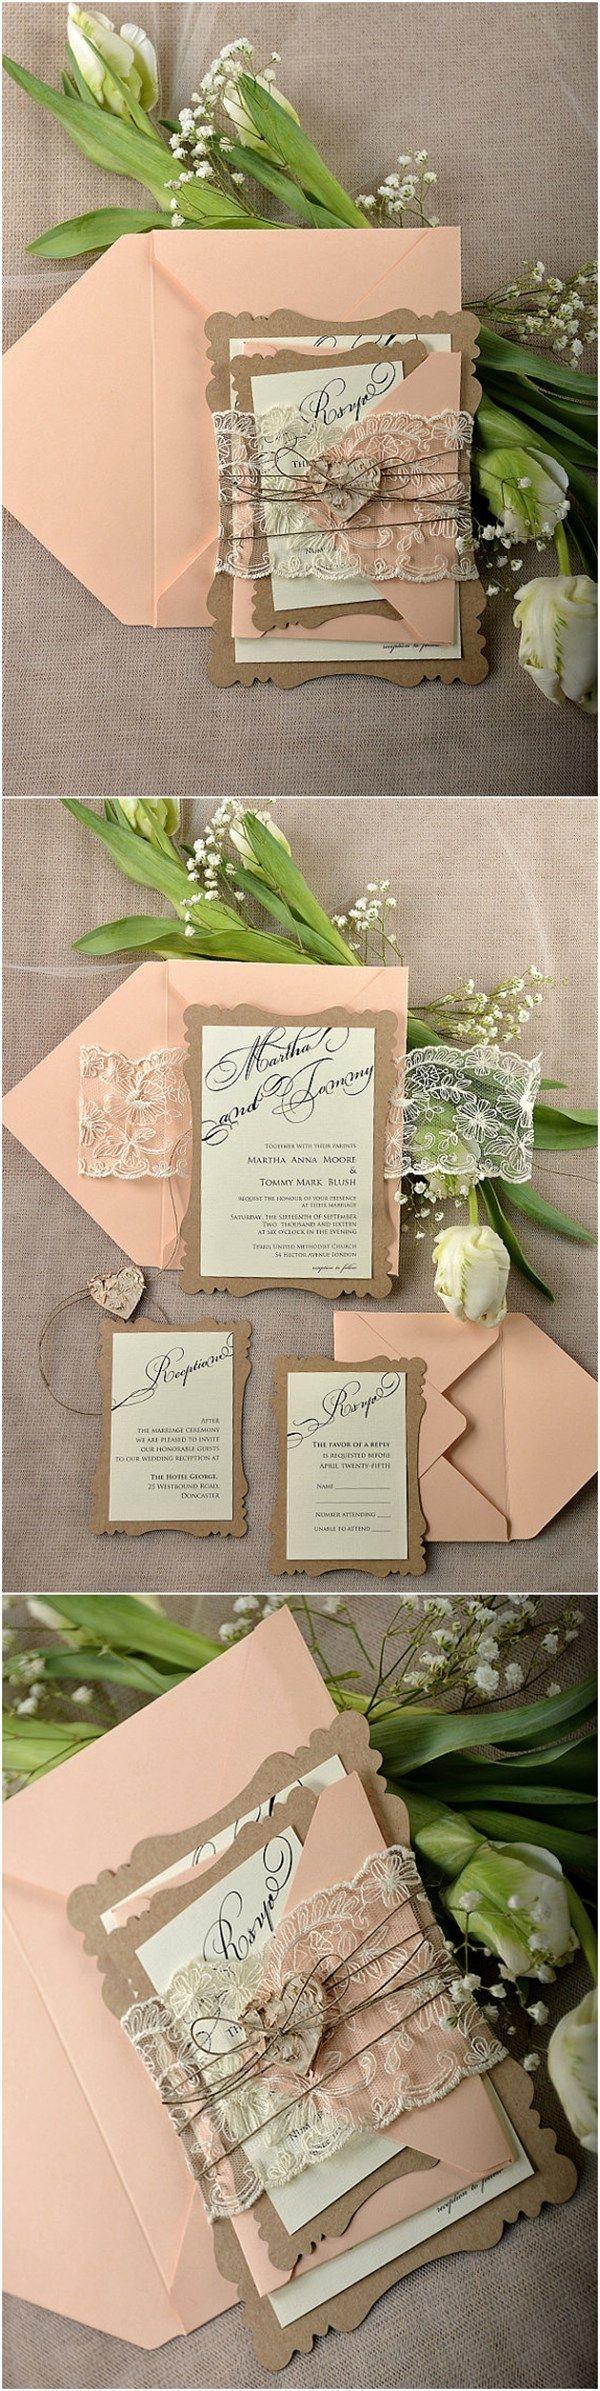 diy wedding invitation kits wedding invitations kits Rustic Eco Peach Lace Laser Cut Wedding Invitation Kits